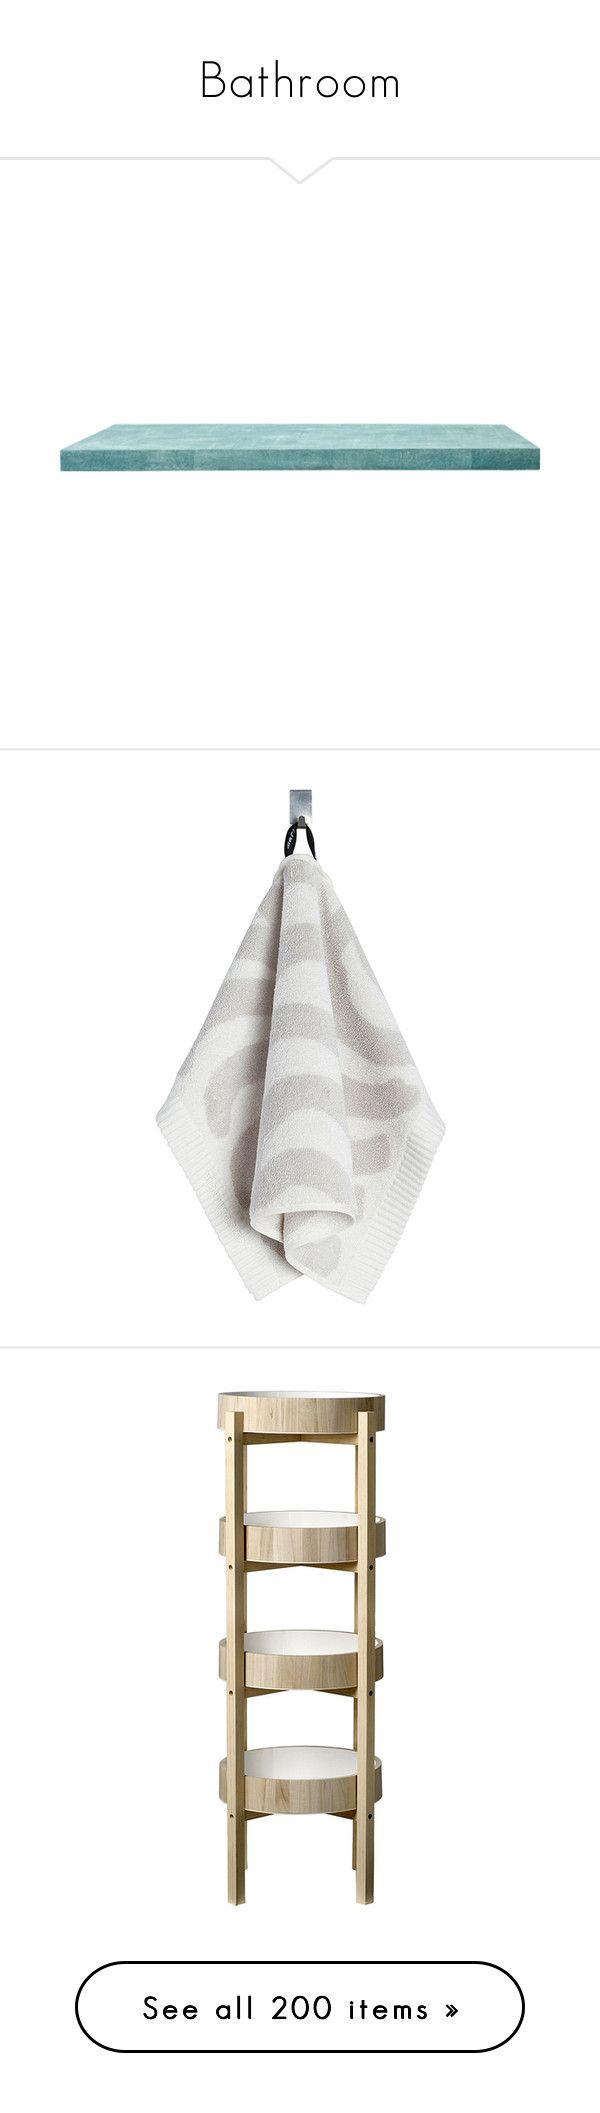 """Bathroom"" by mfoster07 ❤ liked on Polyvore featuring home, bed & bath, bath, bath towels, grey, gray bath towels, marimekko, ivory bath towels, patterned bath towels and grey bath towels"